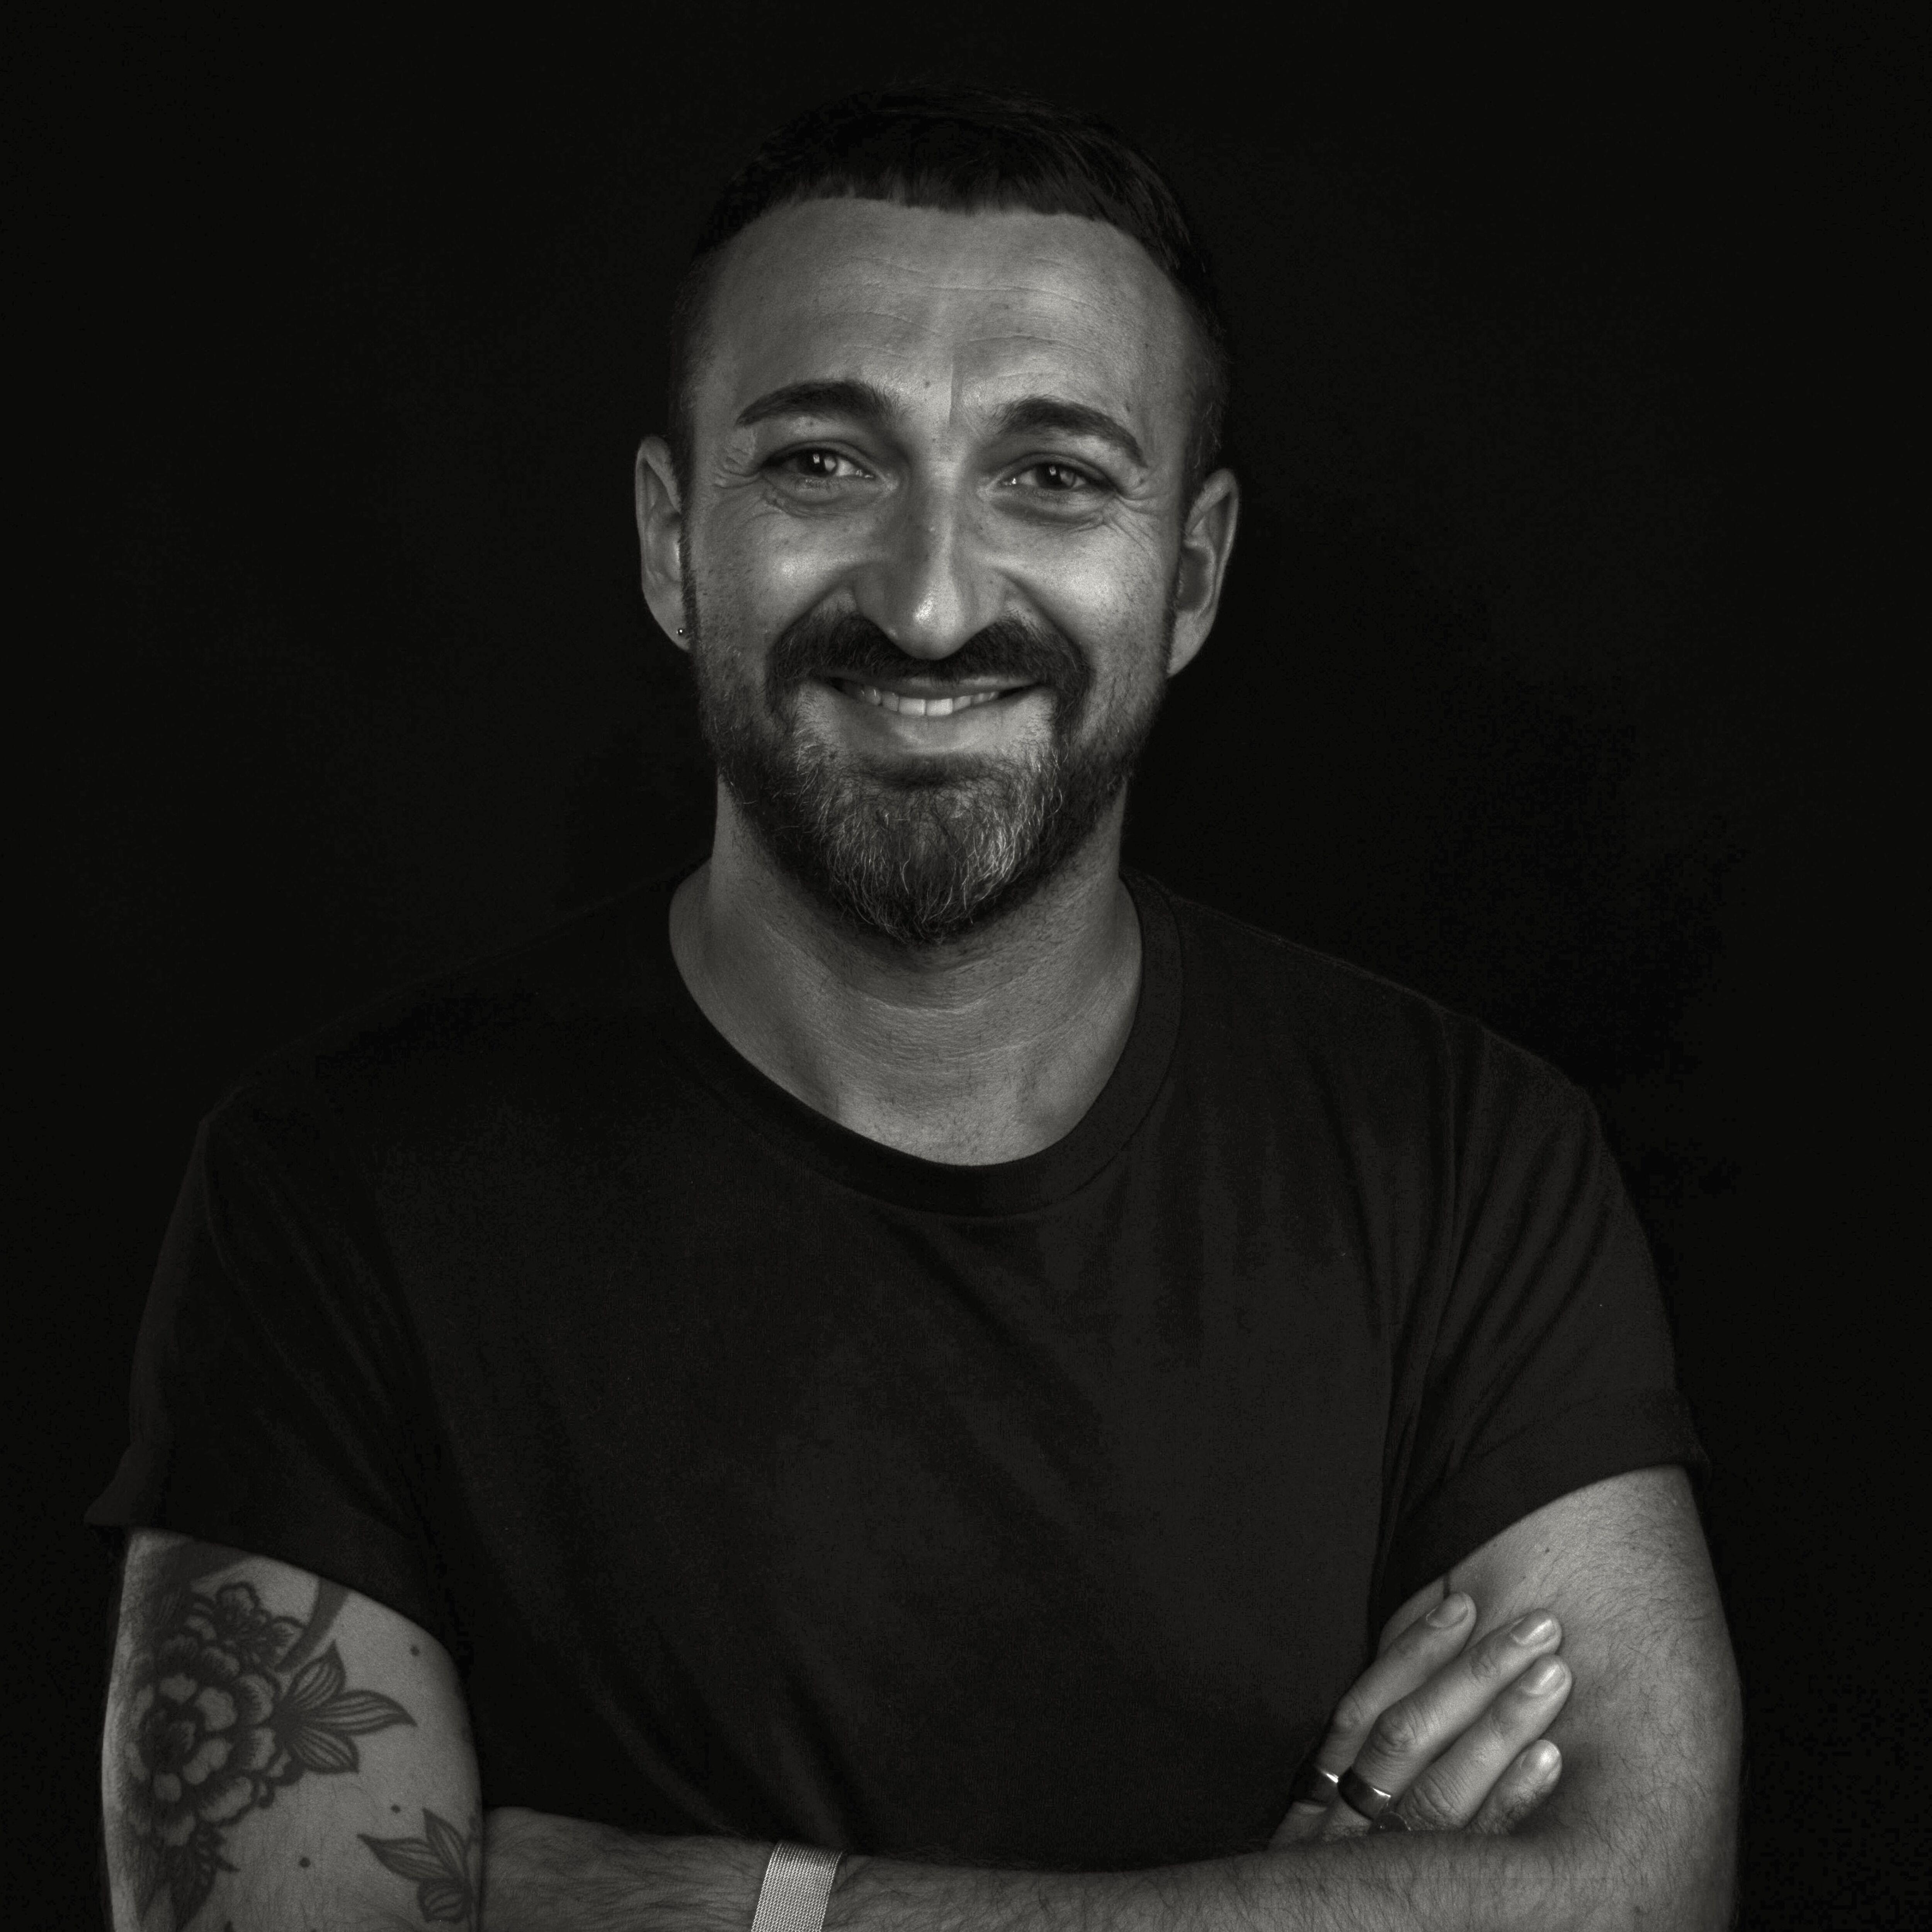 Gianmauro Vella